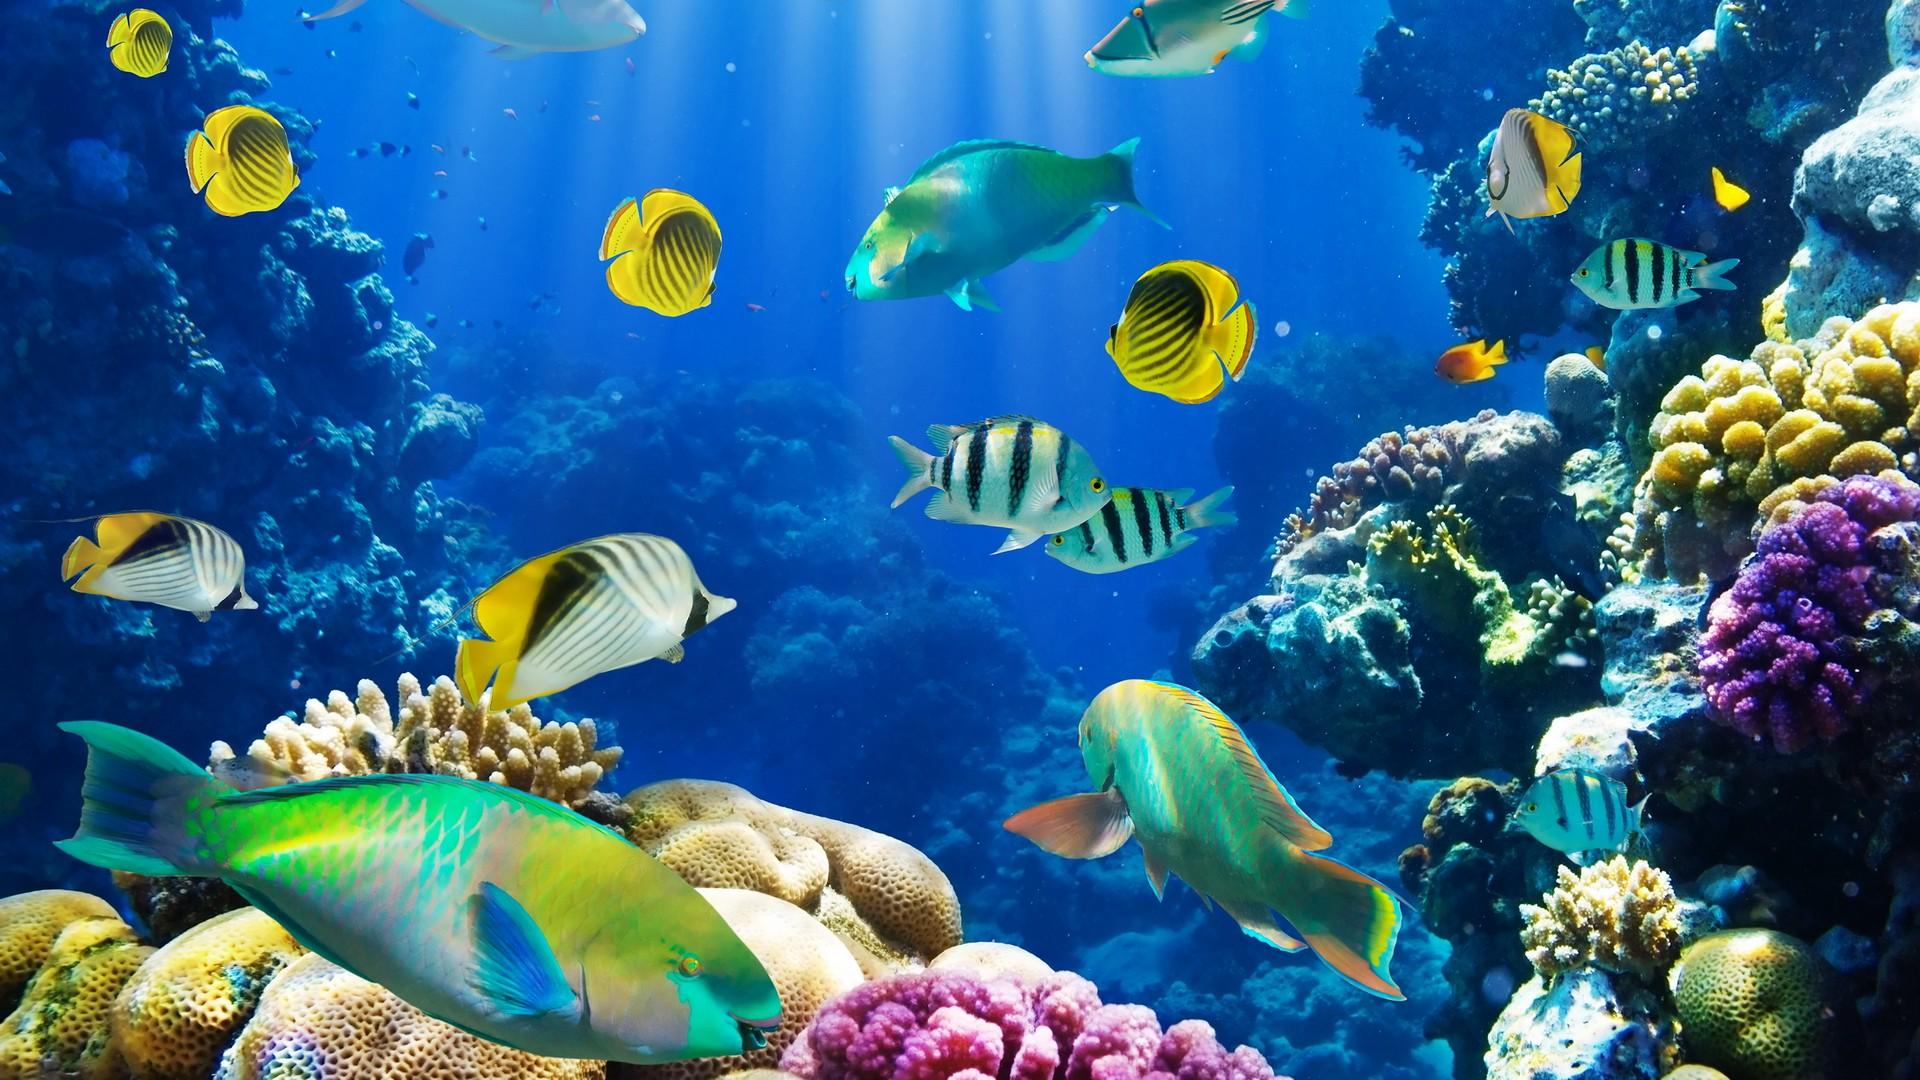 Live Fish Backgrounds wallpaper Live Fish Backgrounds hd wallpaper 1920x1080